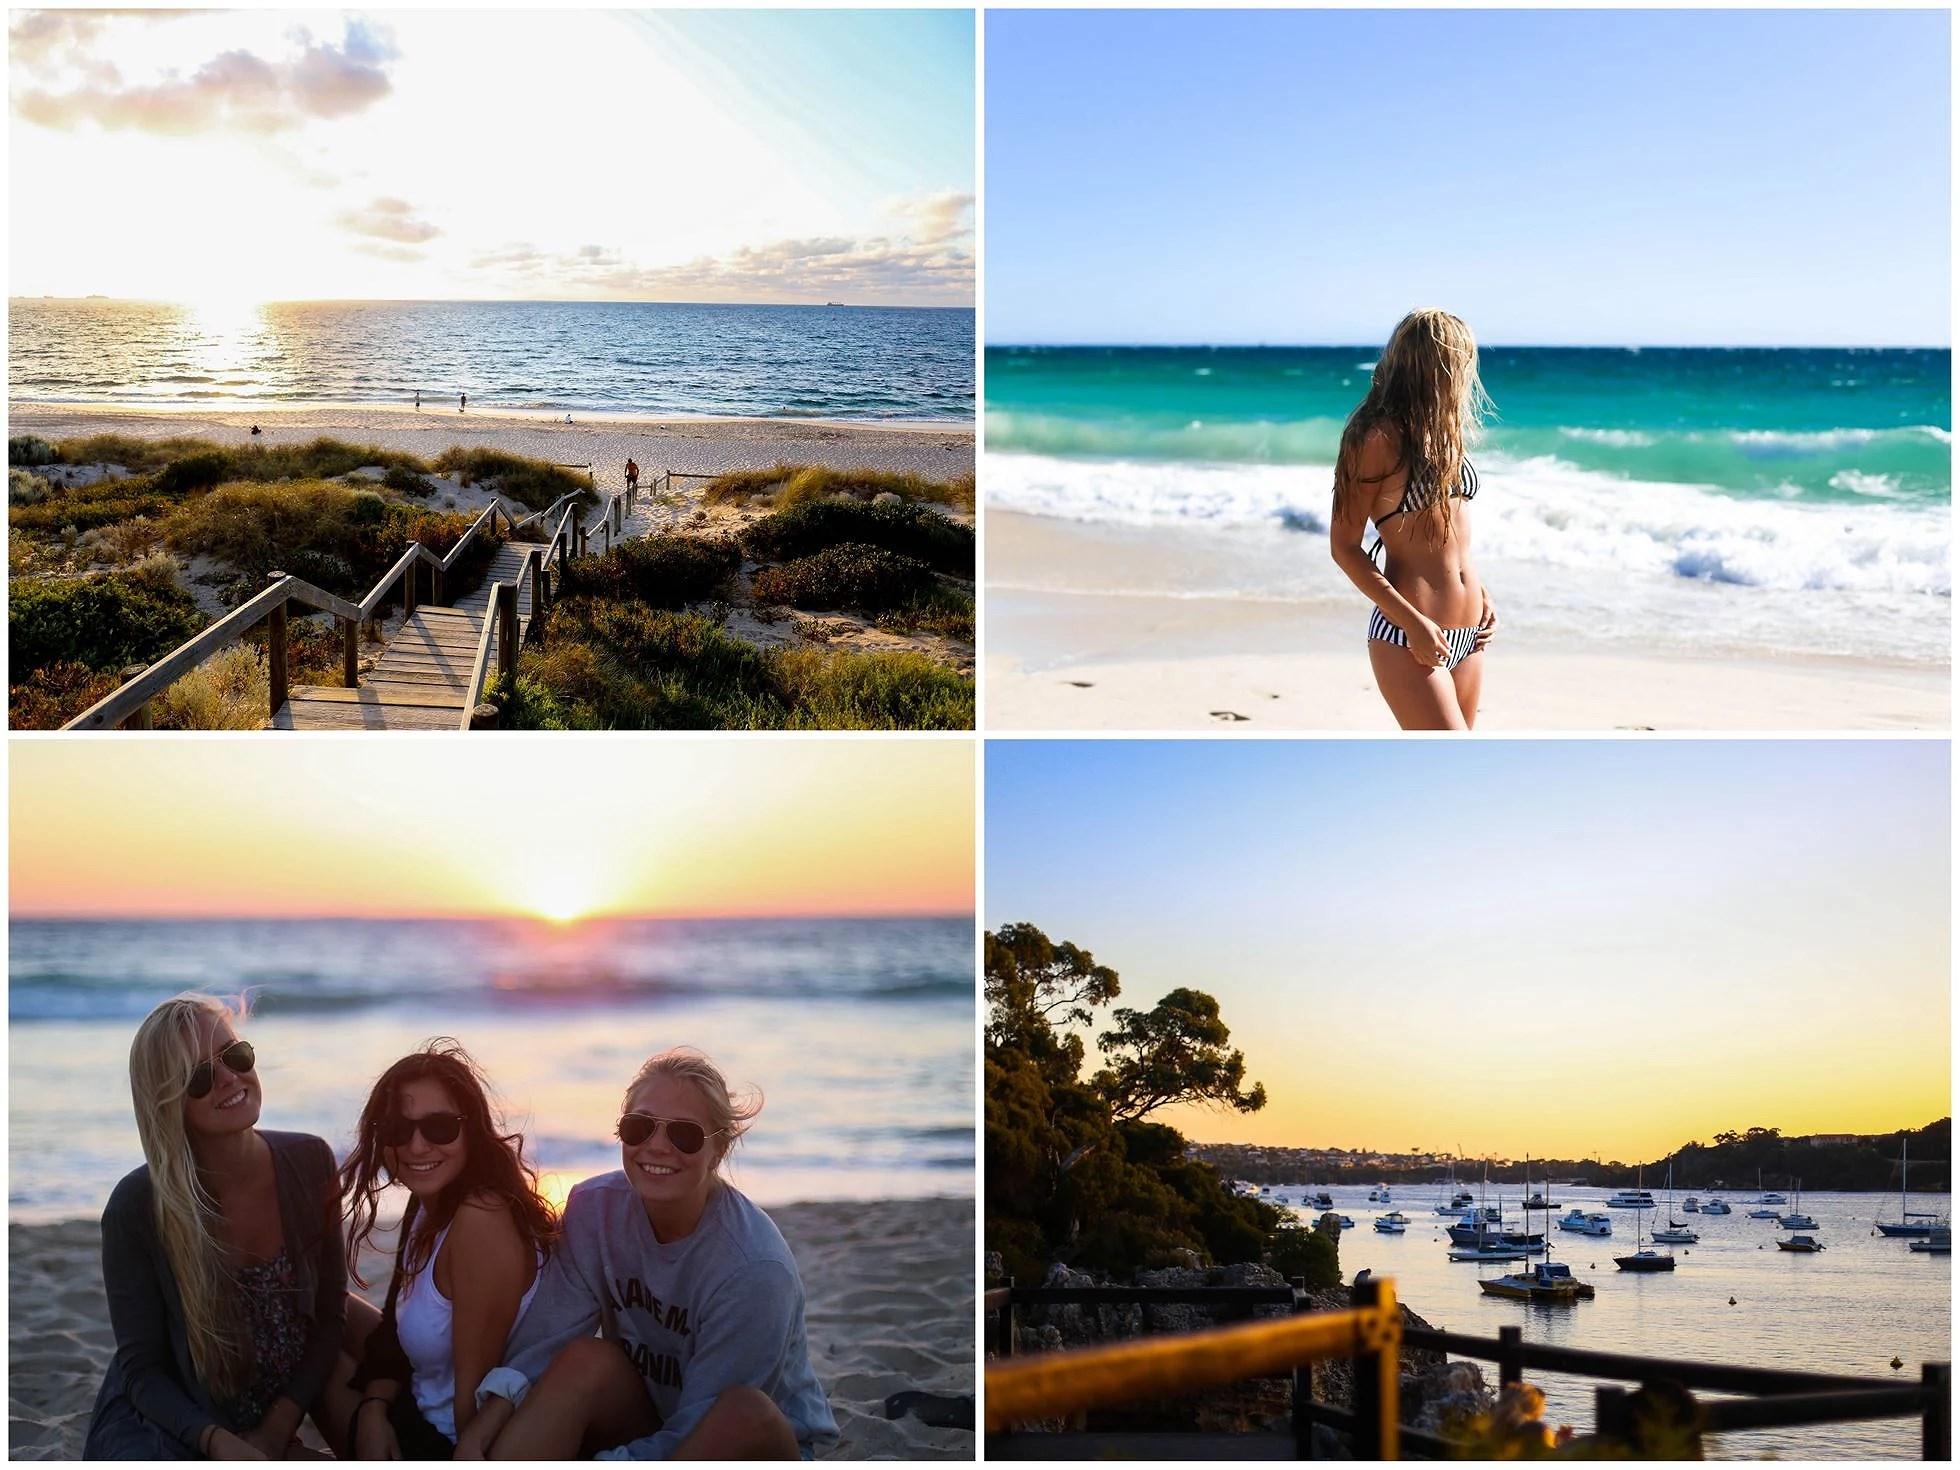 australien-blogg-2